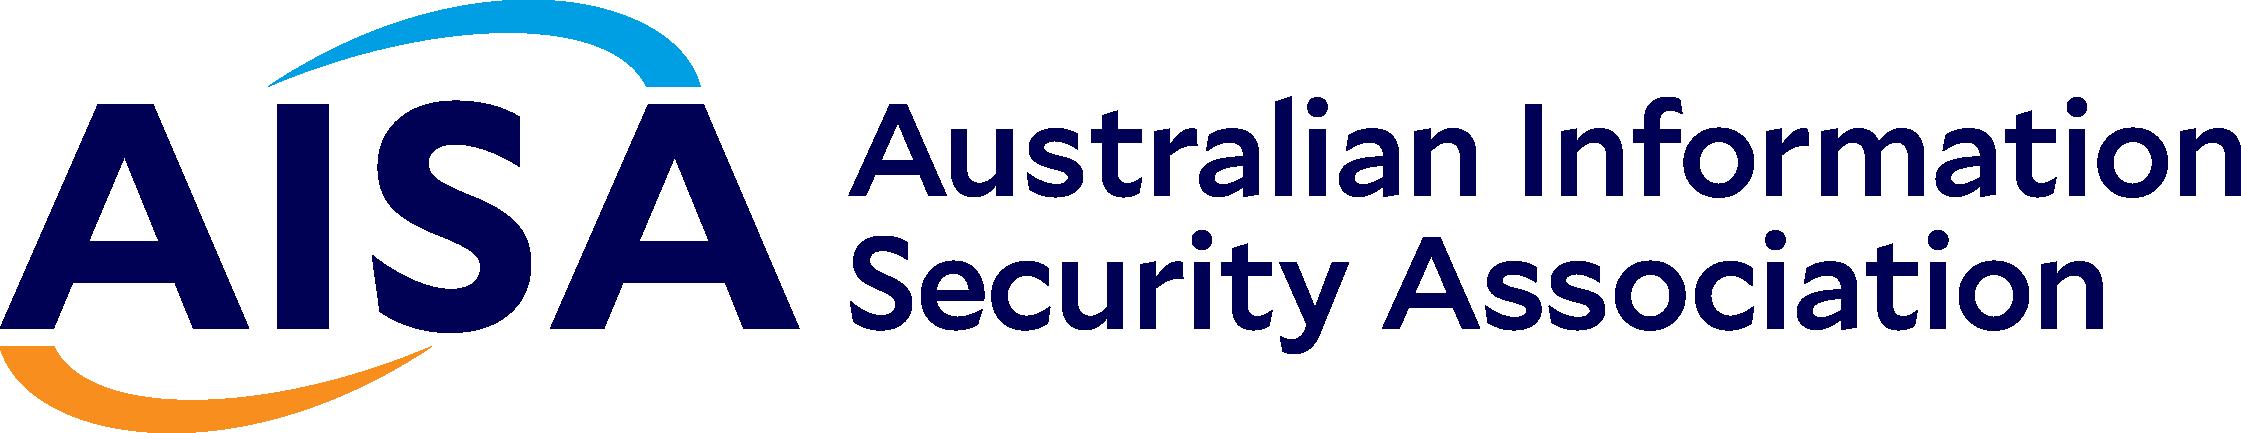 Logotipo de AISA (Australian Information Security Association)